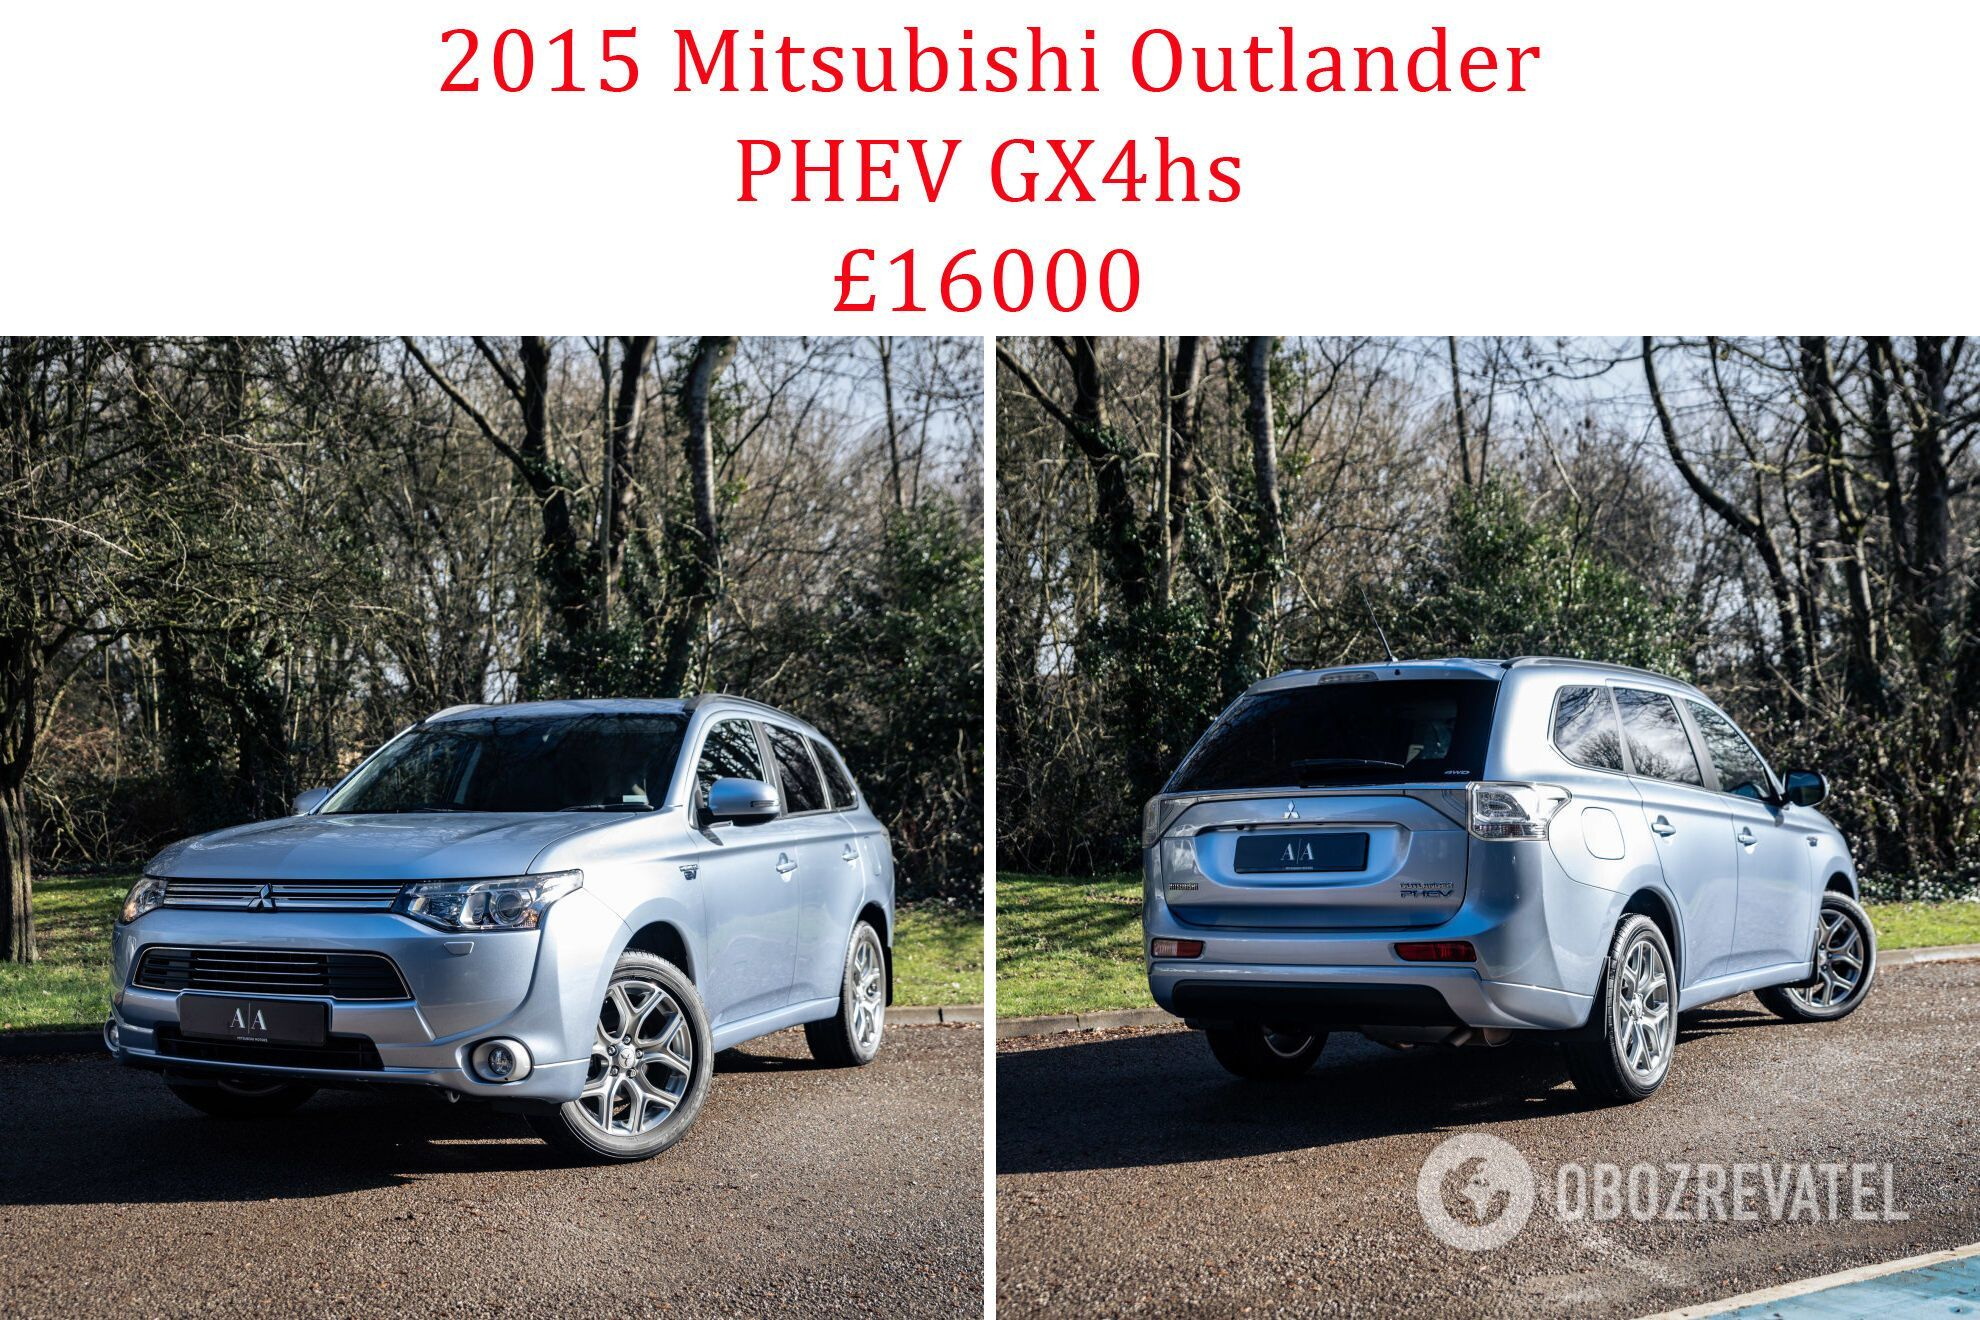 2015 Mitsubishi Outlander PHEV GX4hs